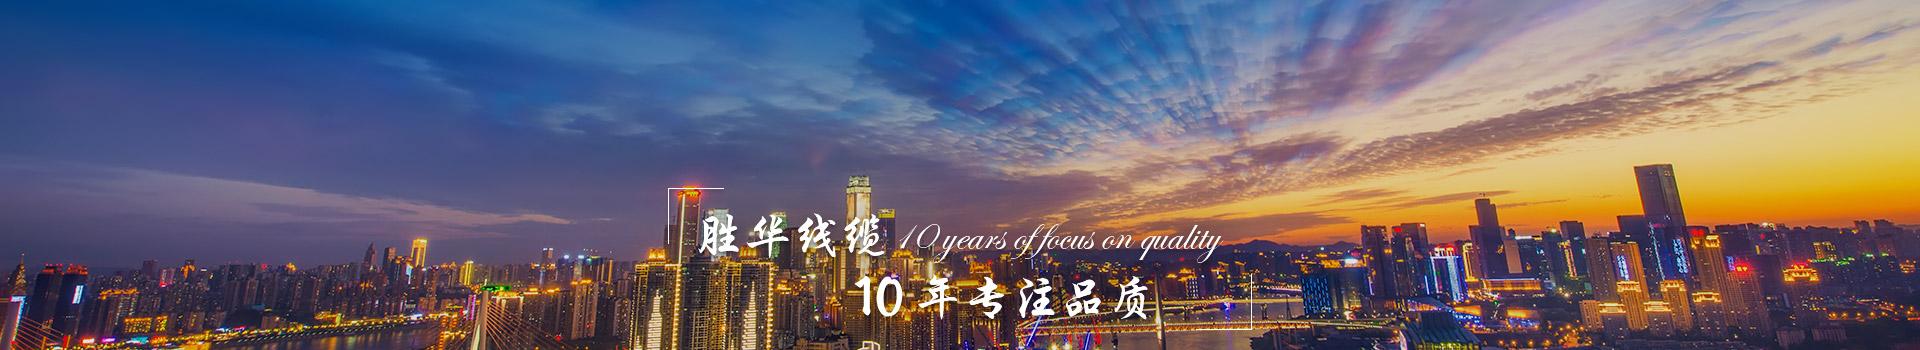 wwwyzc88官网亚洲城ca88电脑版官网厂家